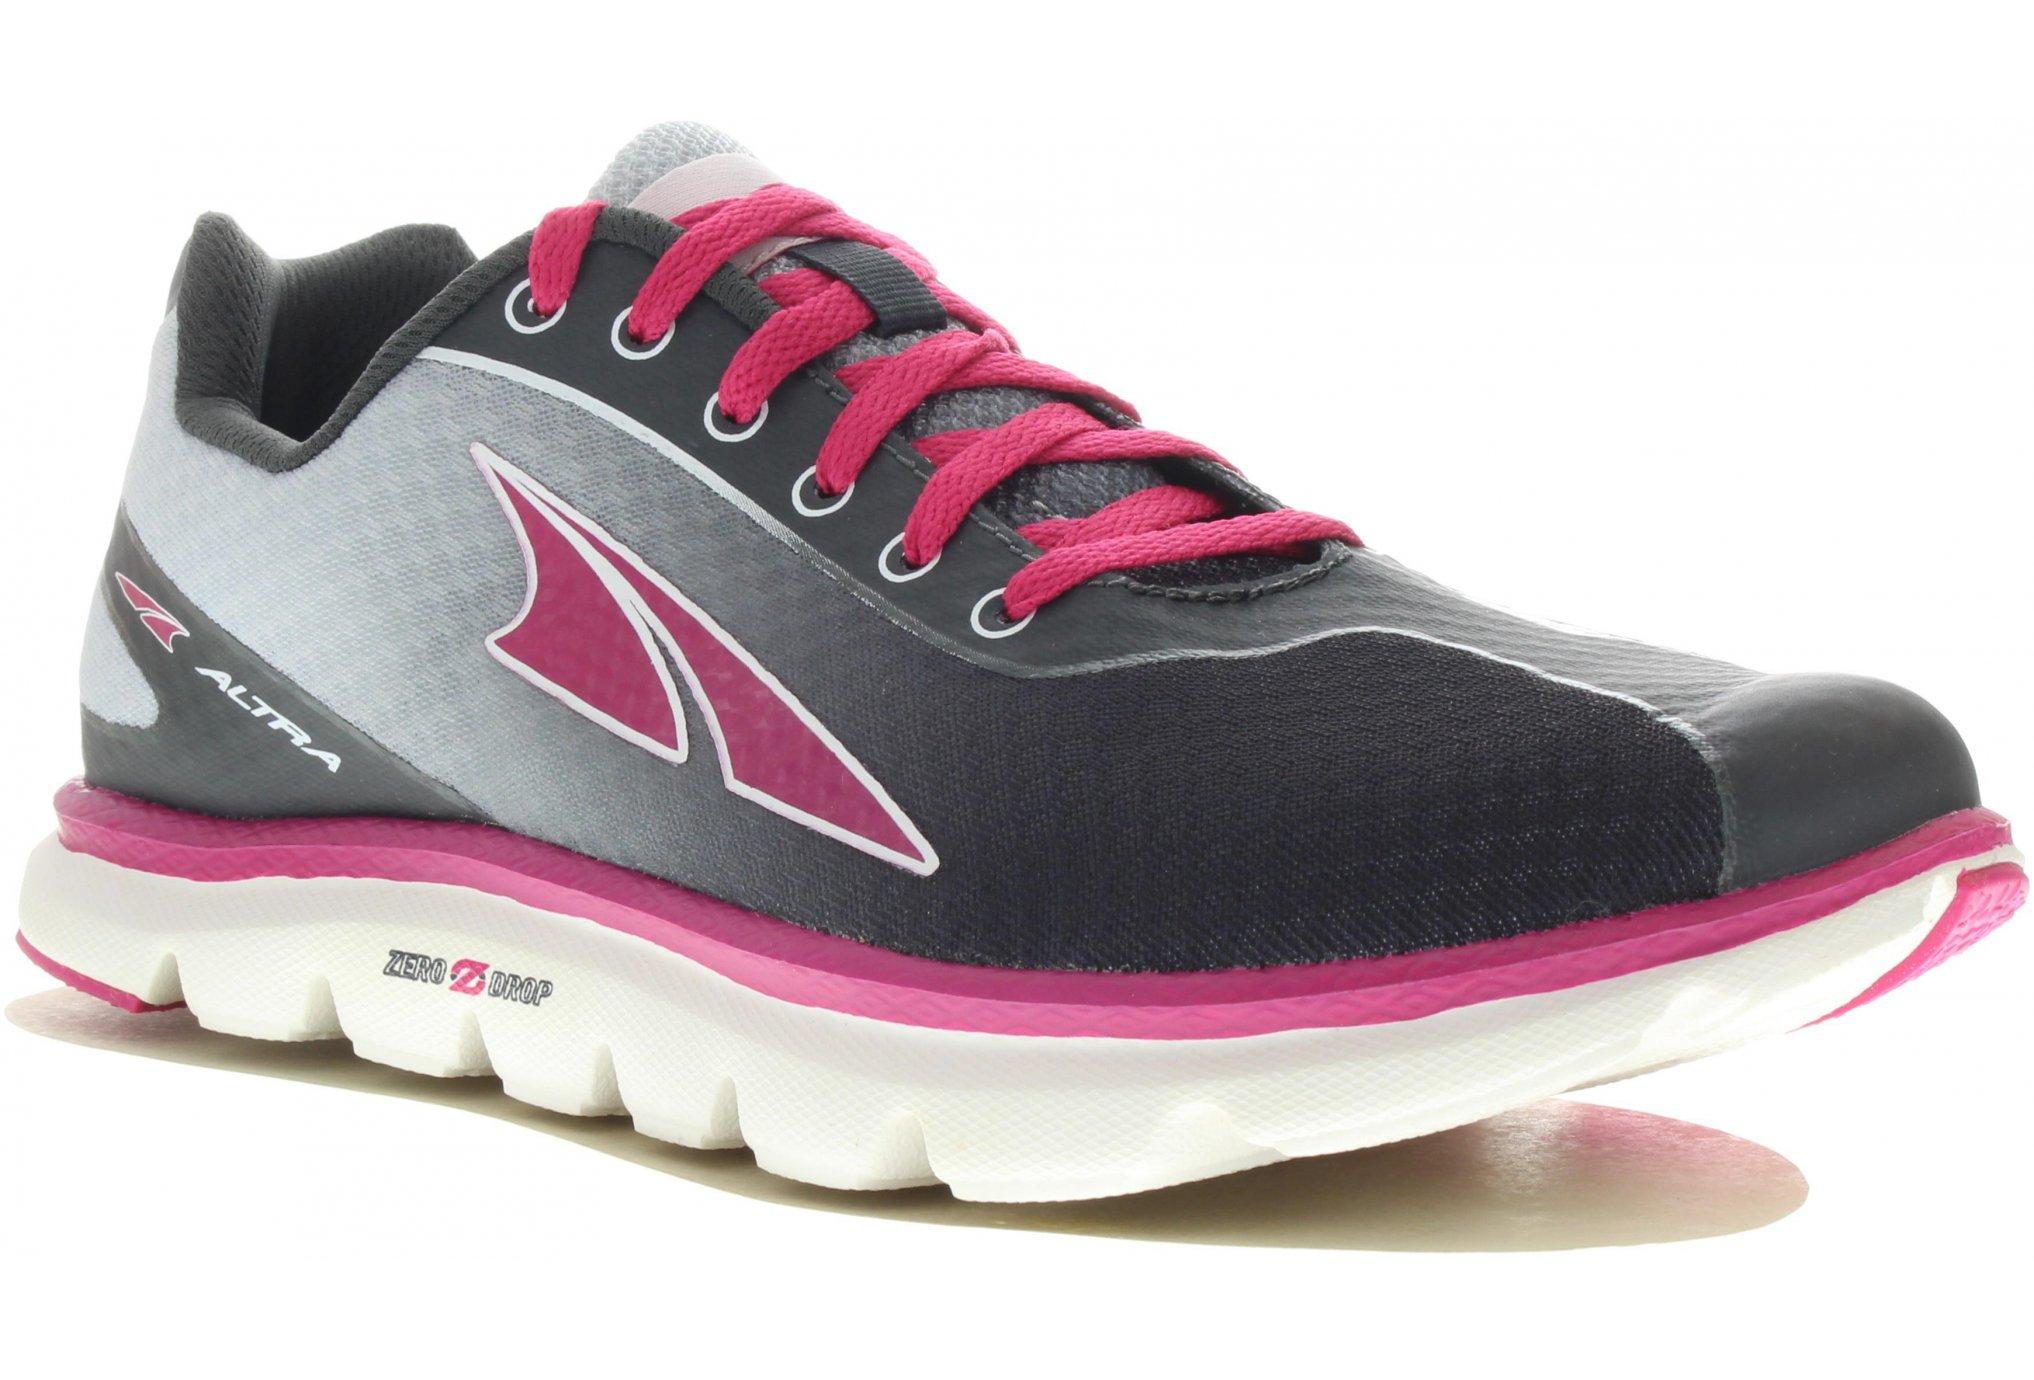 Altra One 2.5 w chaussures running femme